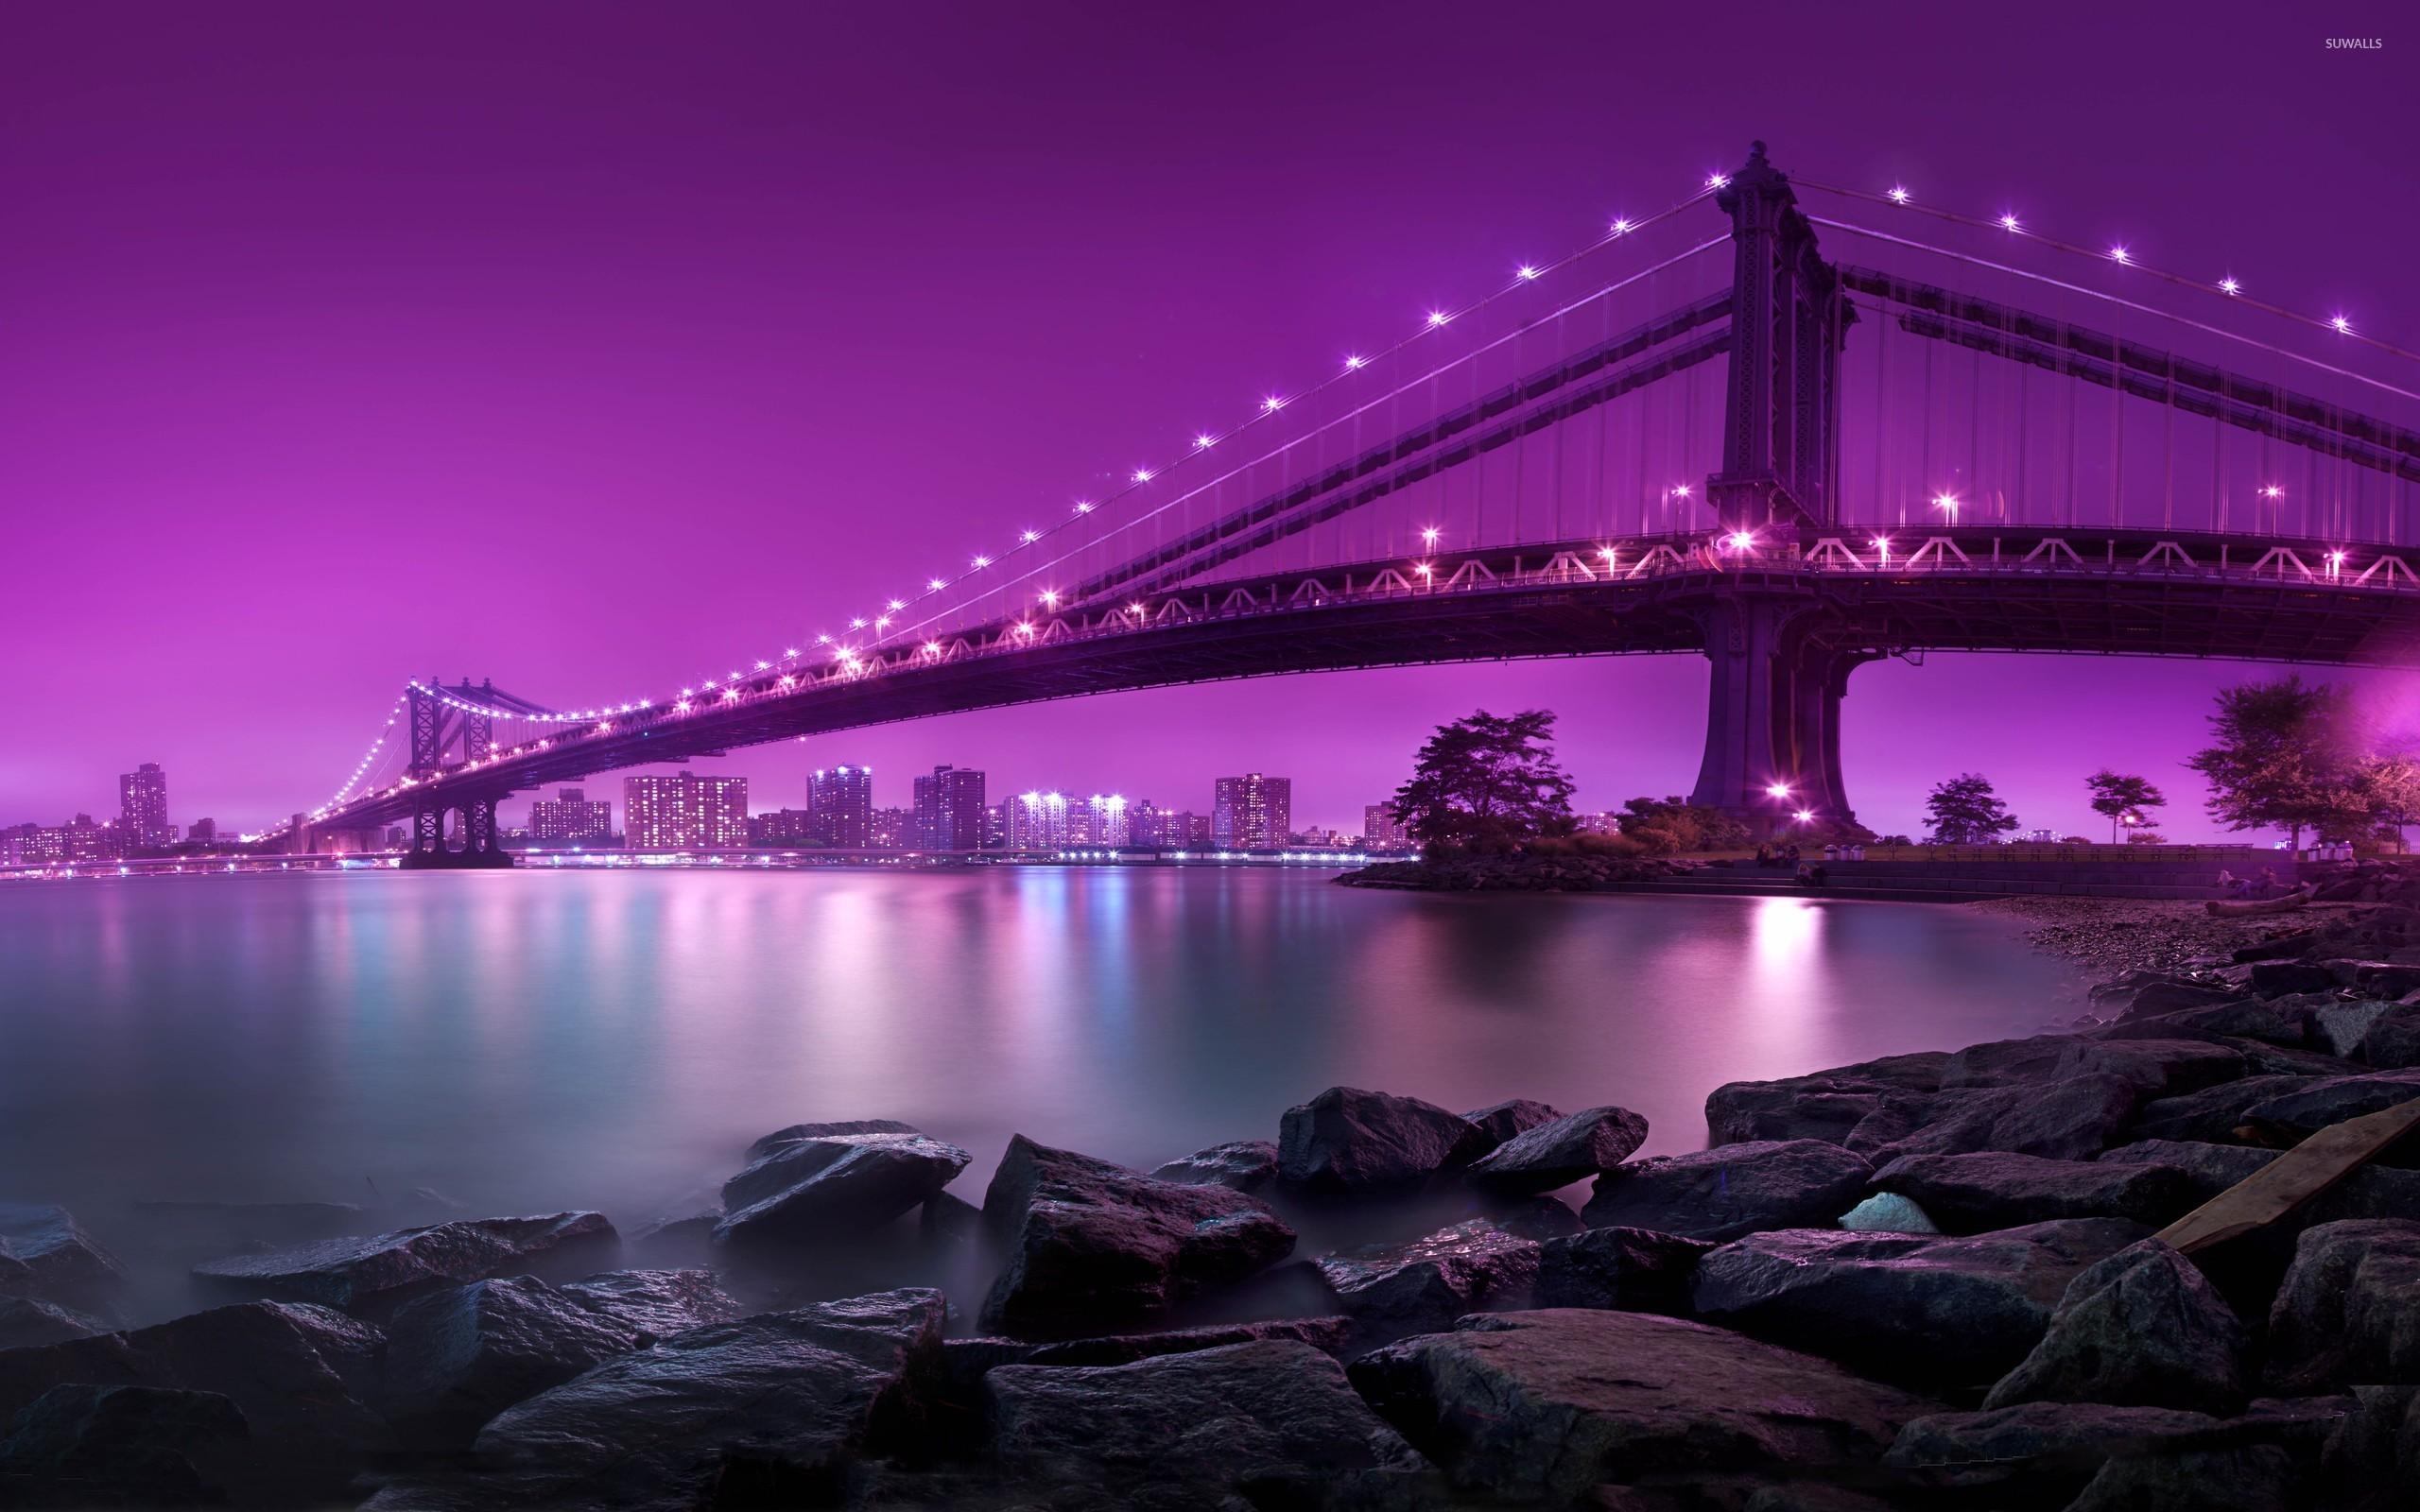 Манхэттенский мост, Нью-Йорк, США.